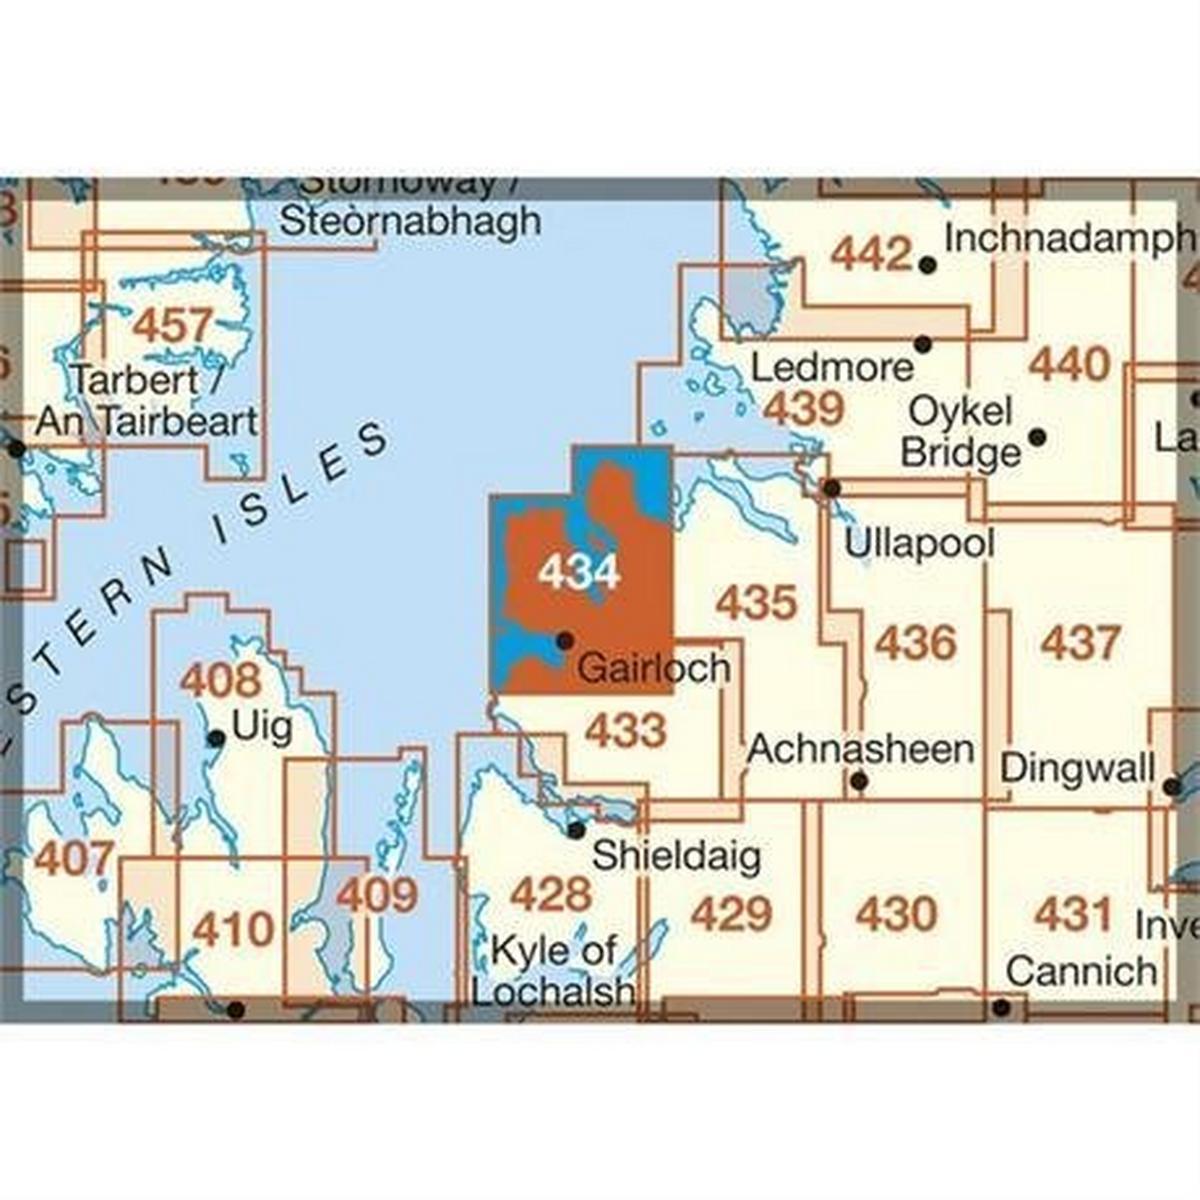 Ordnance Survey OS Explorer Map 434 Gairloch and Loch Ewe